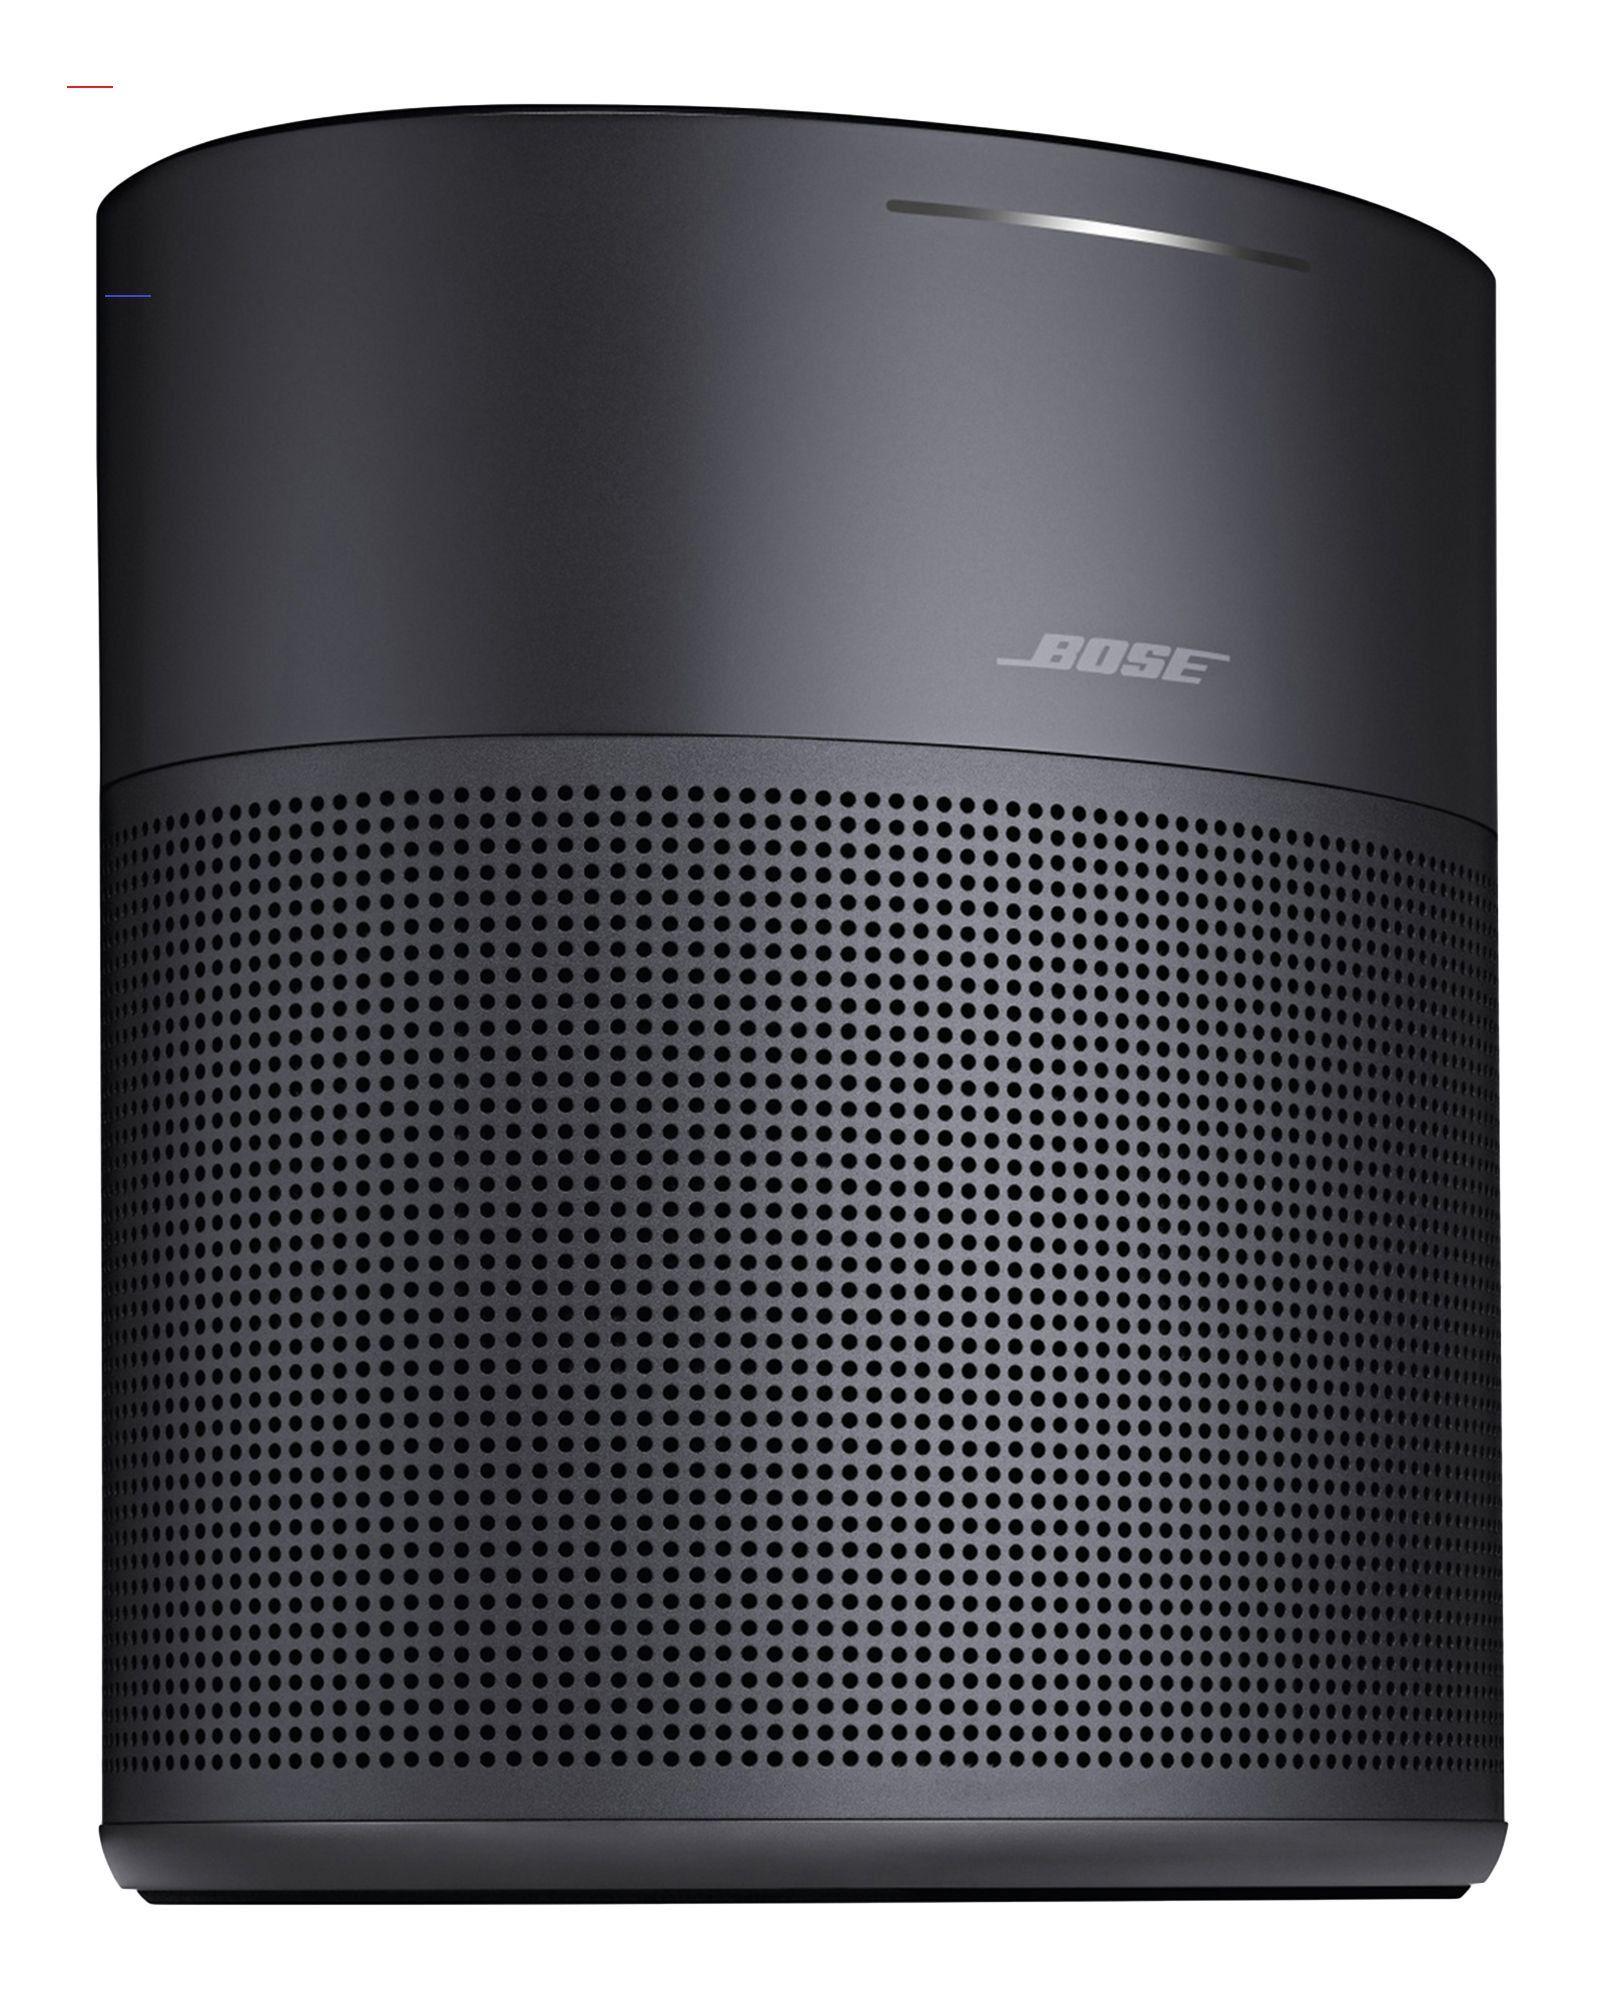 Black Home Speaker 300 componentspeakers Compact